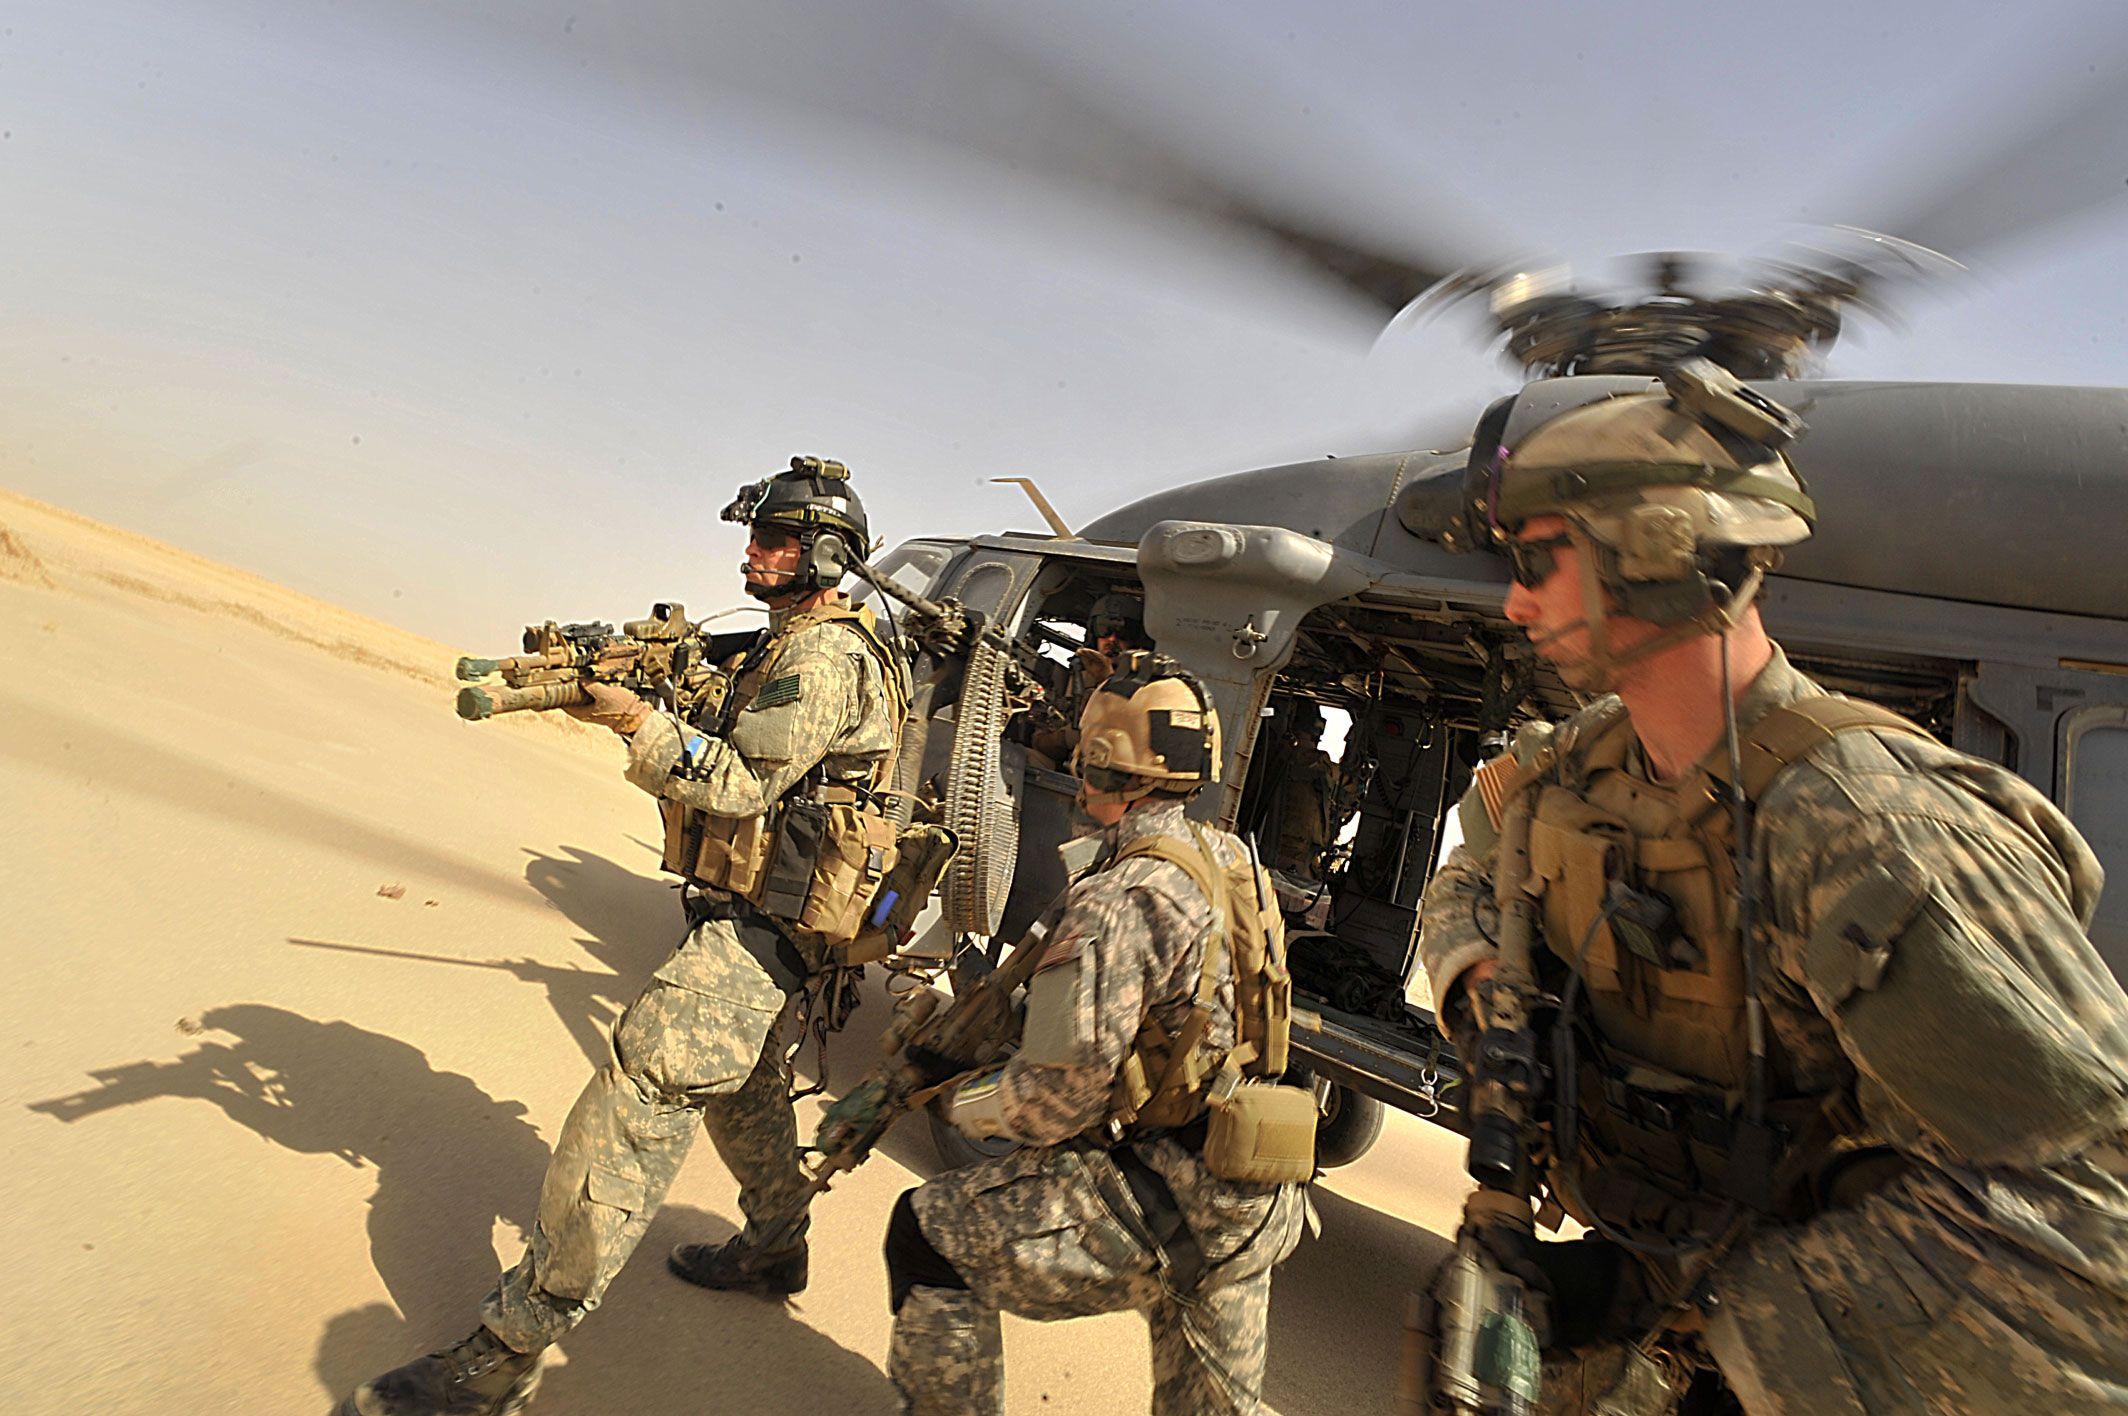 USAF Pararescuemen HH60G Pavehawk Helicopter Usaf